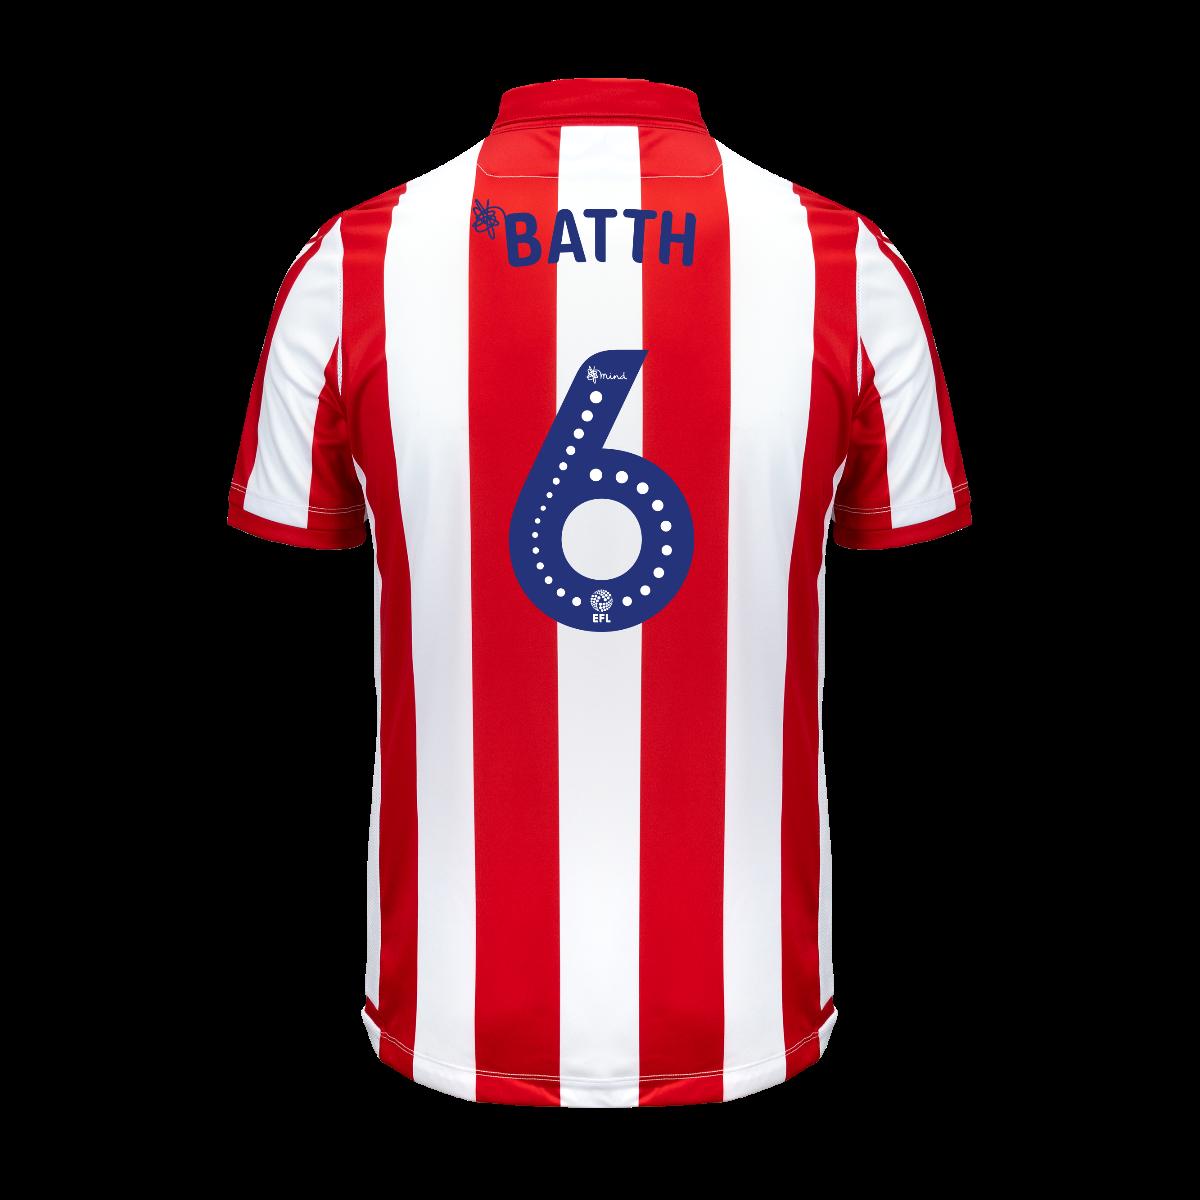 2019/20 Adult Home SS Shirt - Batth